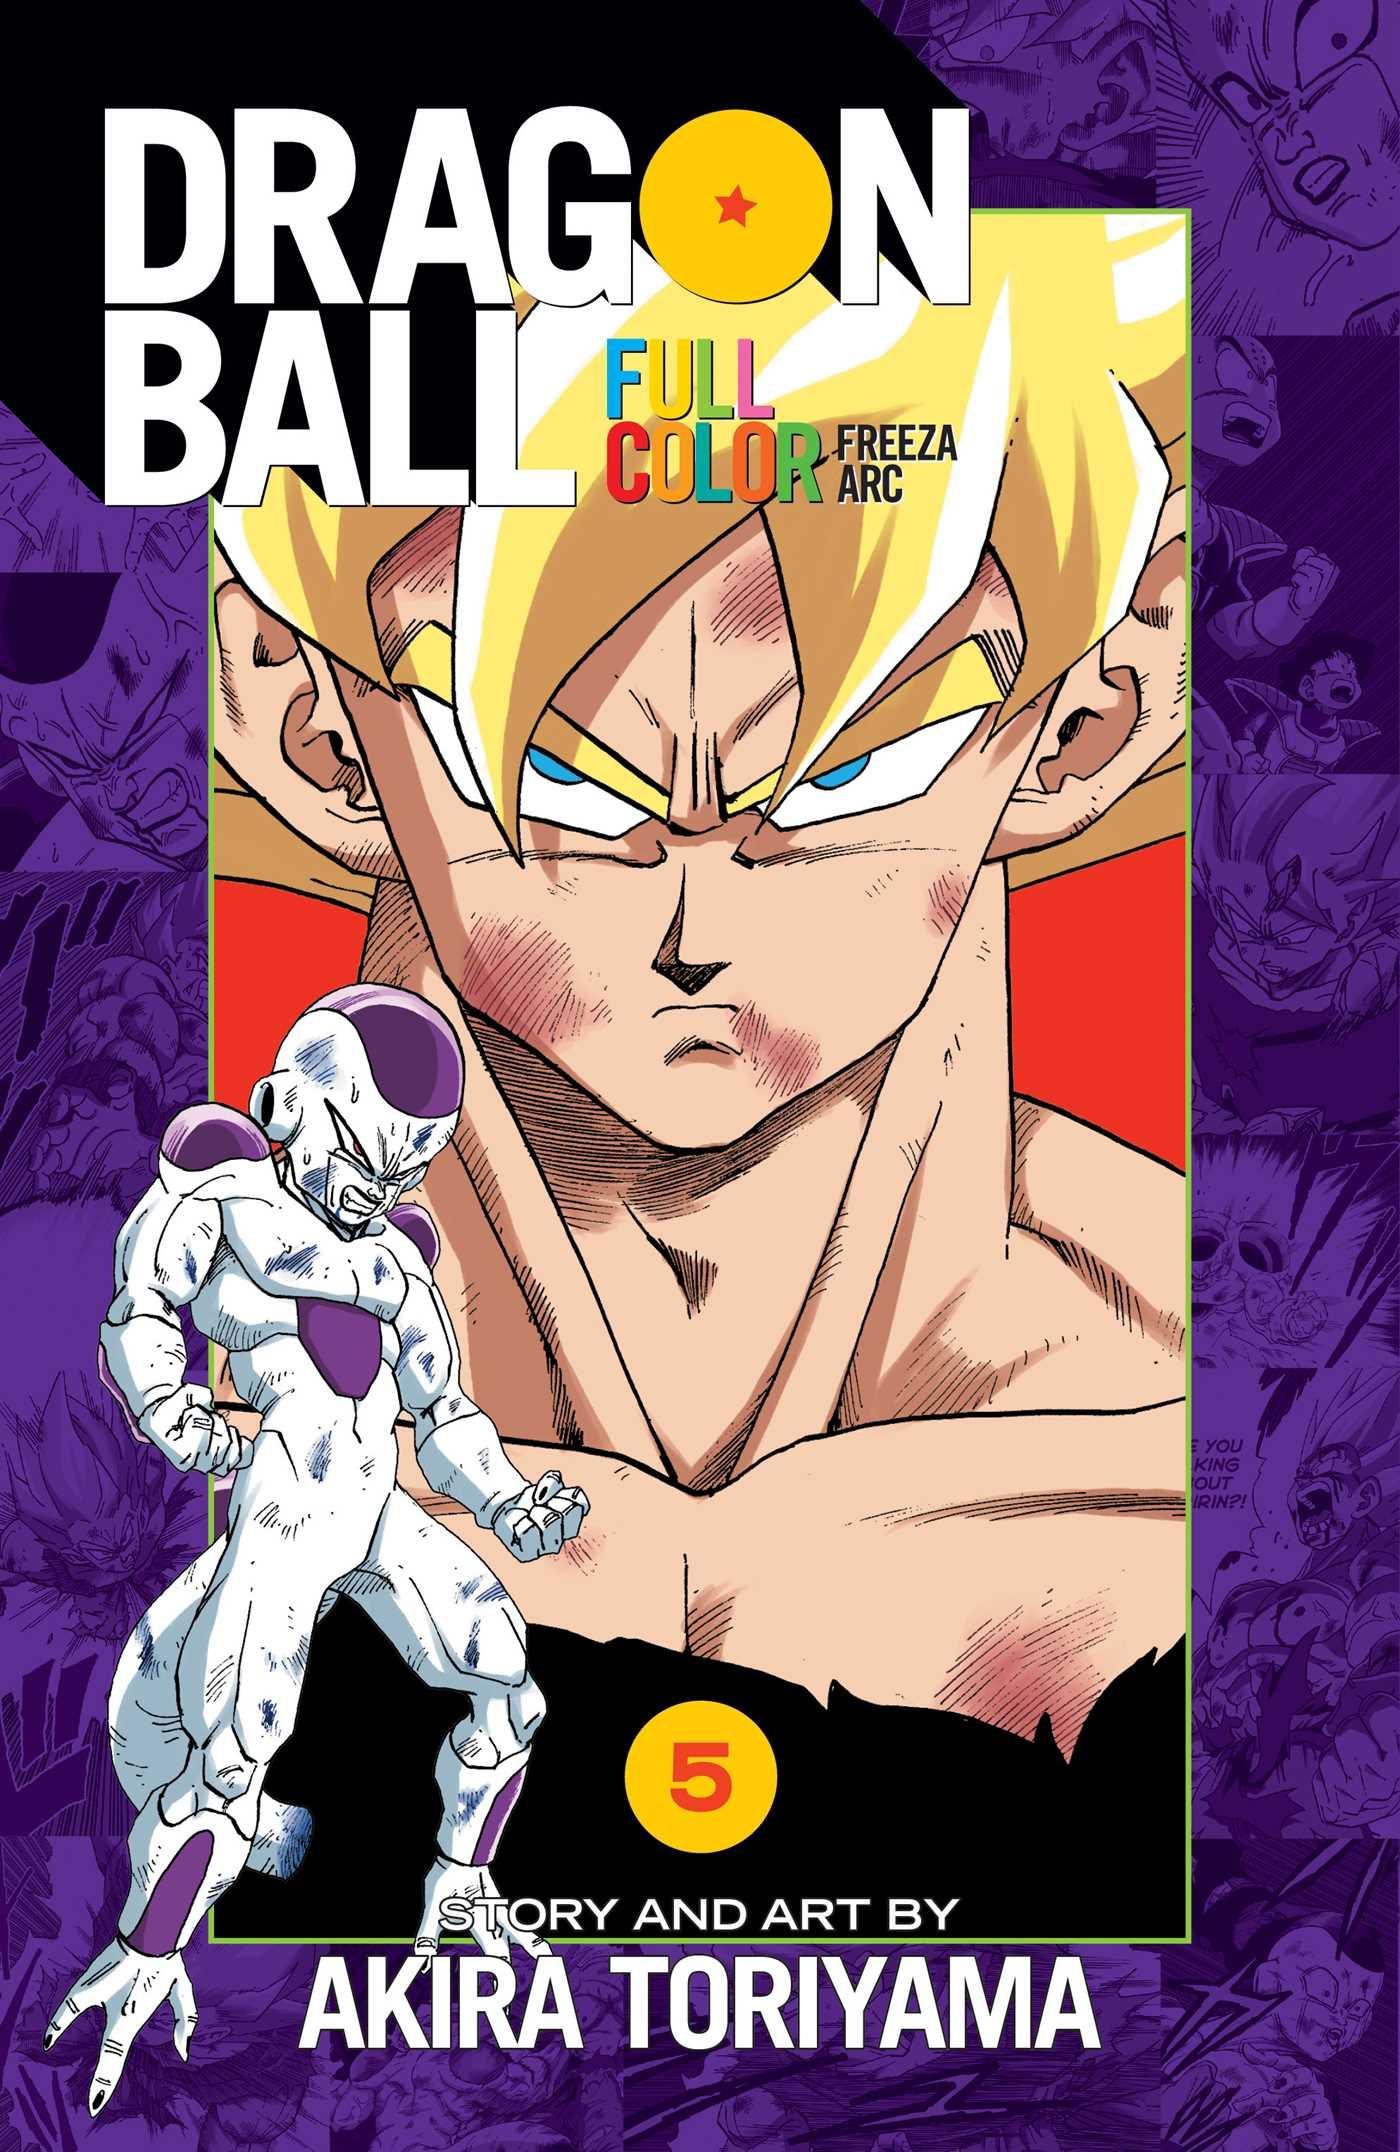 Dragon Ball Full Color Freeza Arc Manga Volume 5